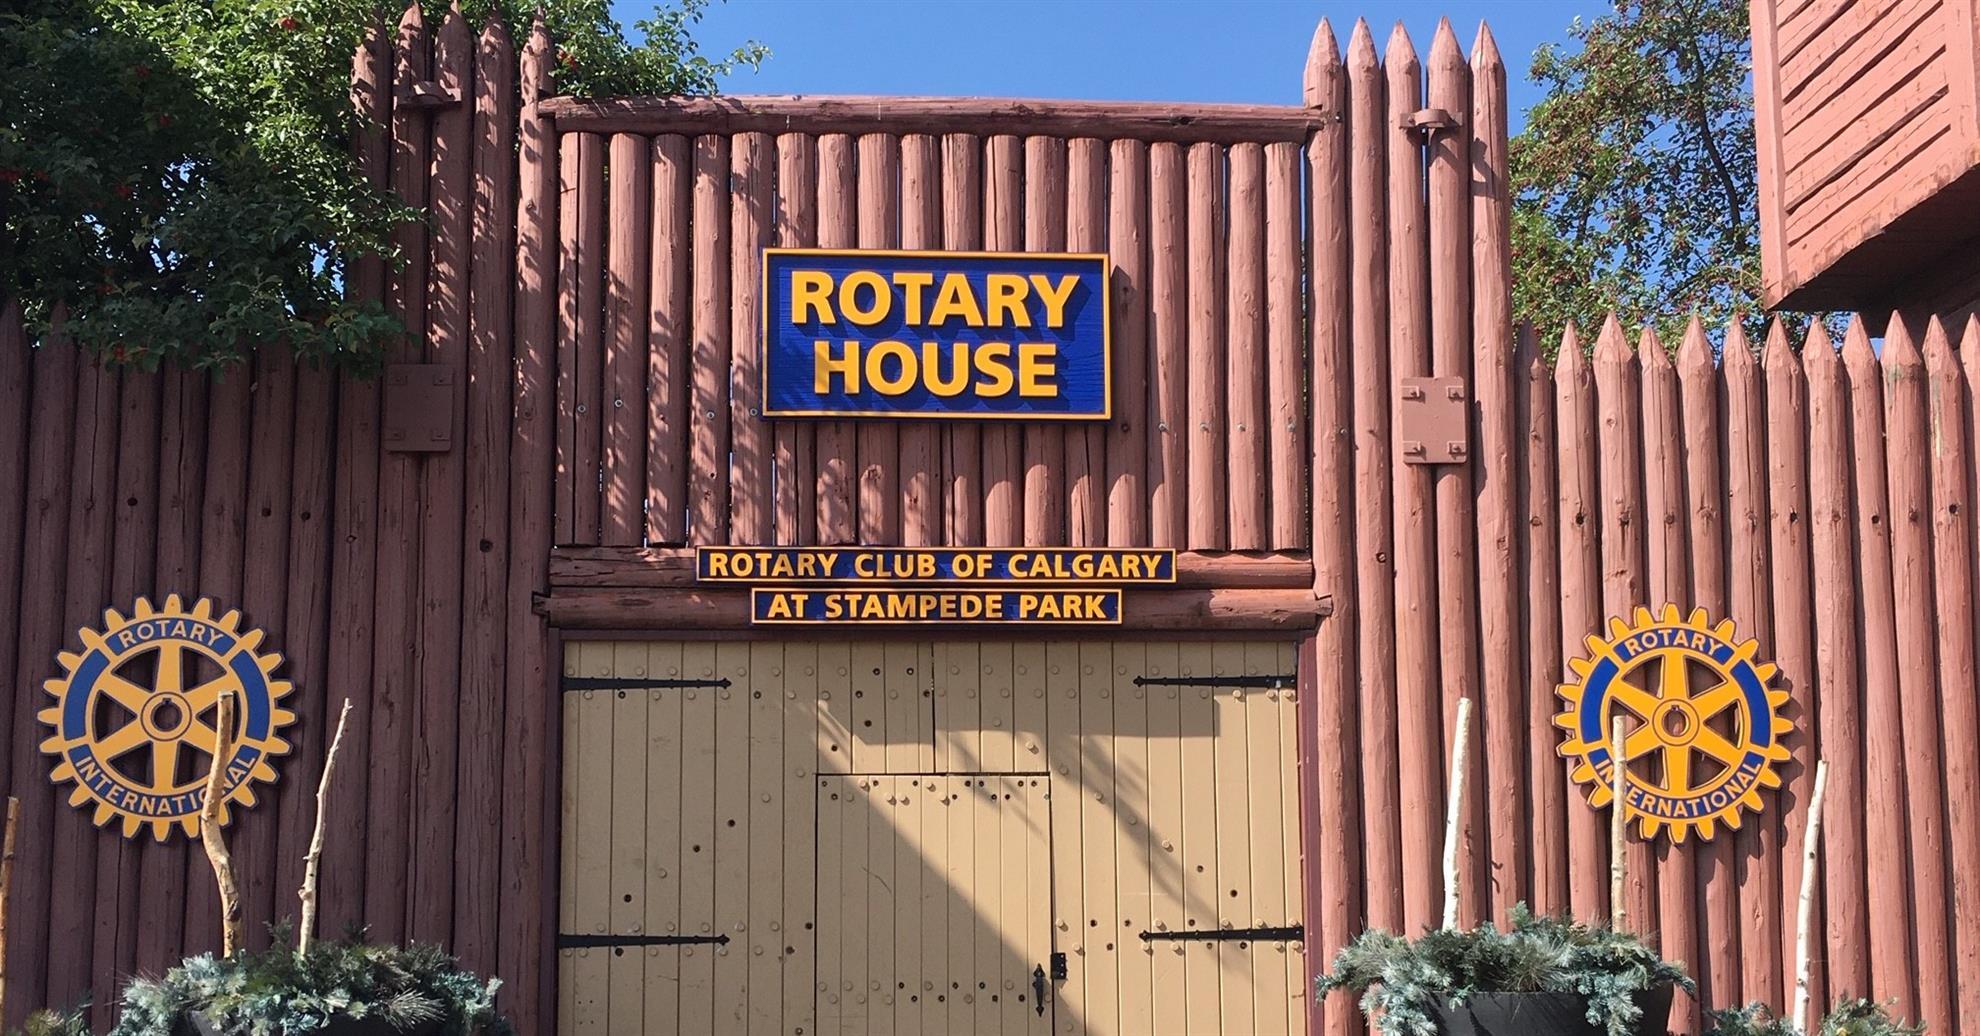 Rotary House